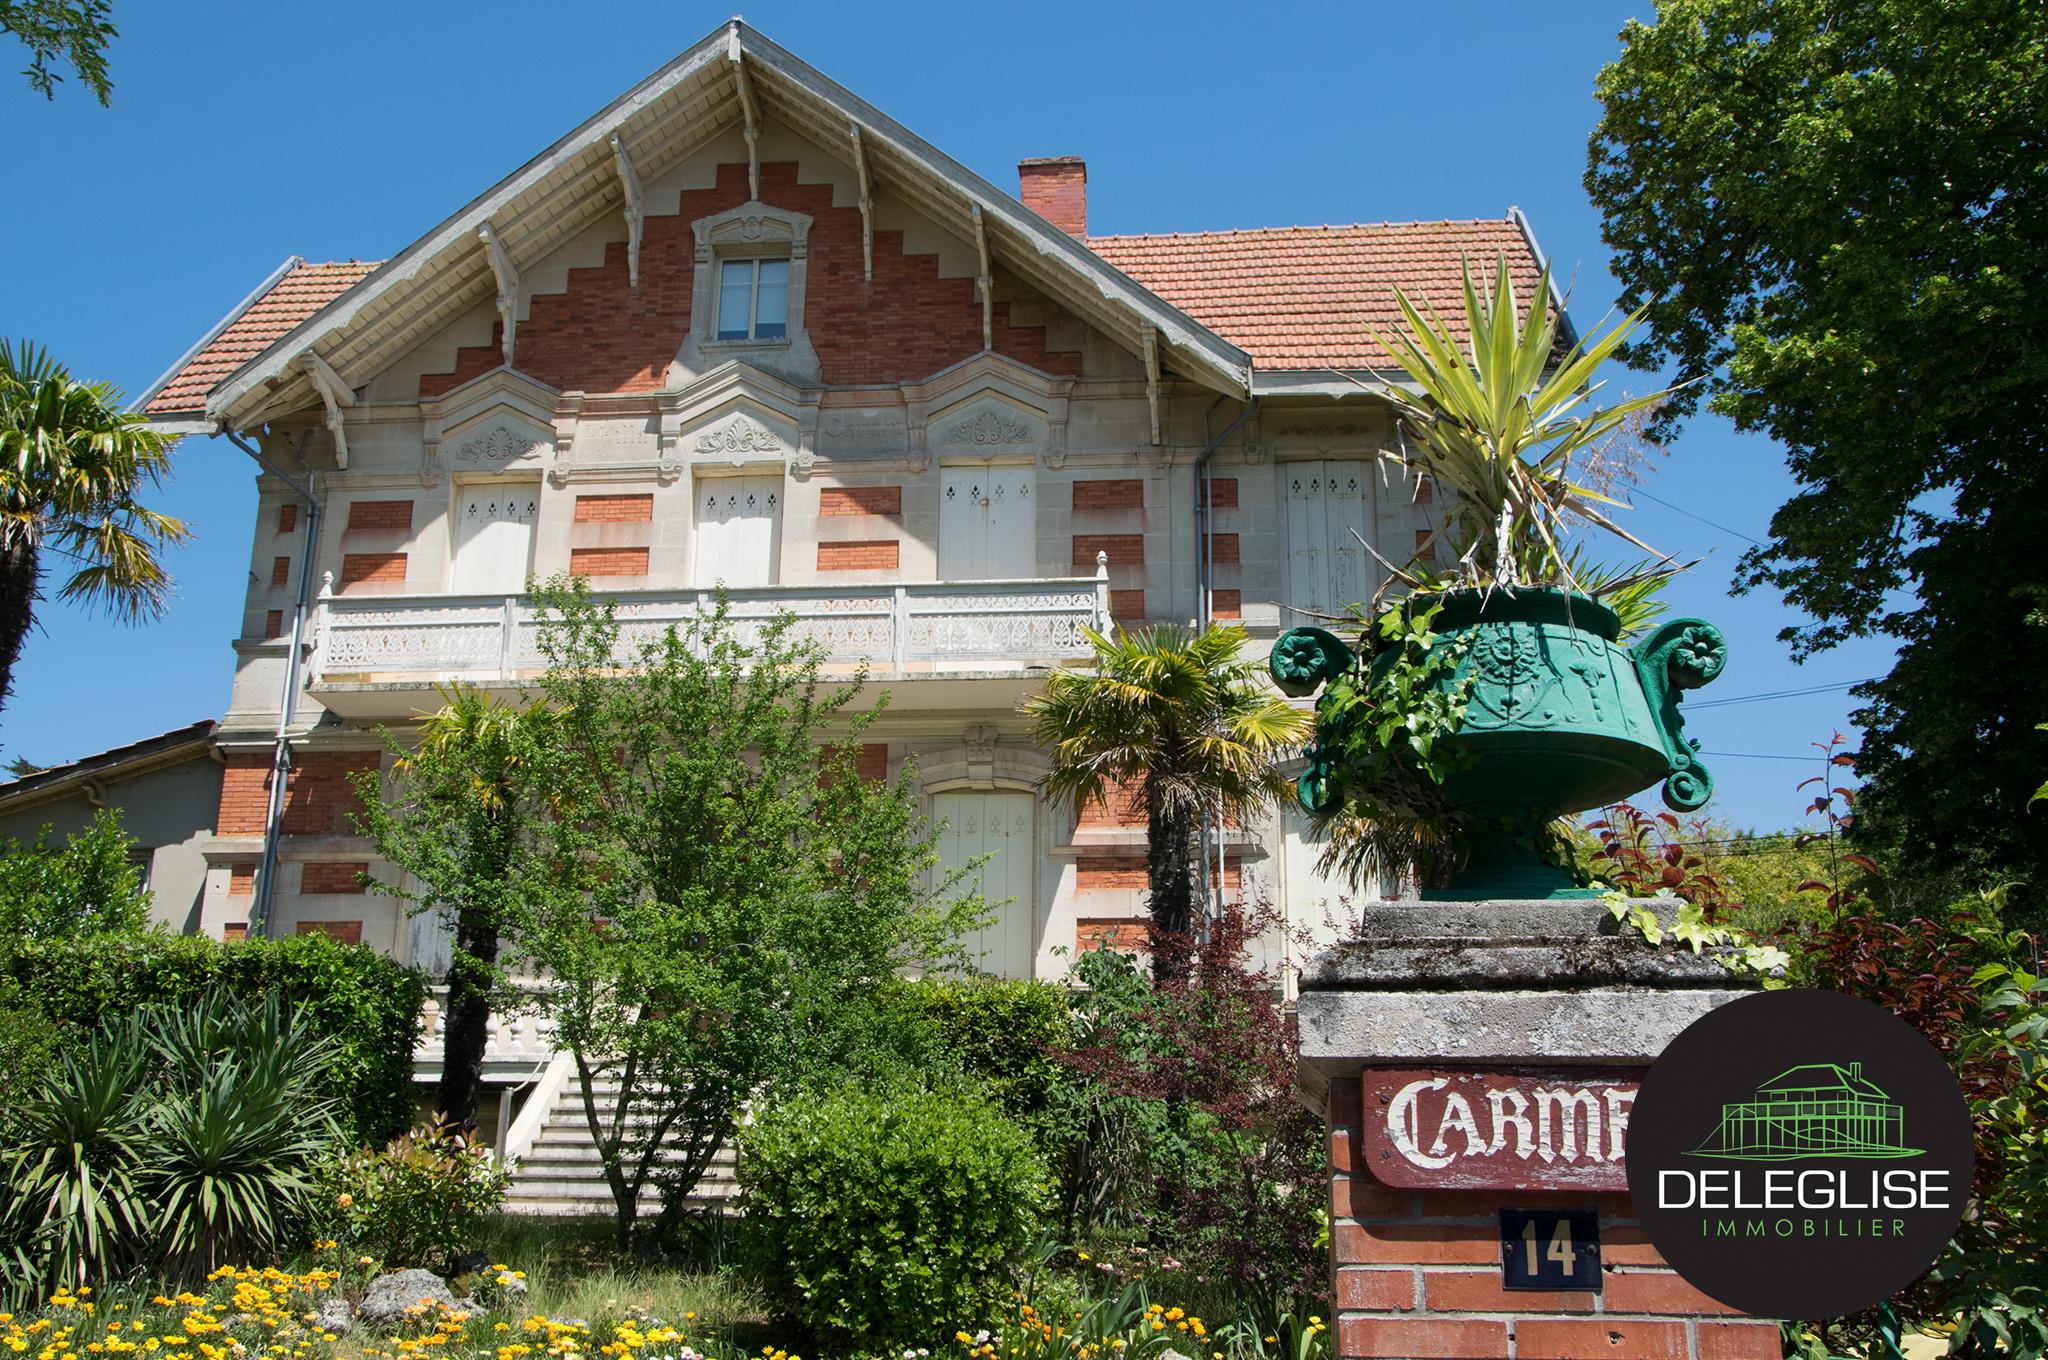 Villa carmen ville d 39 hiver arcachon del glise immobilier for Conception de la villa